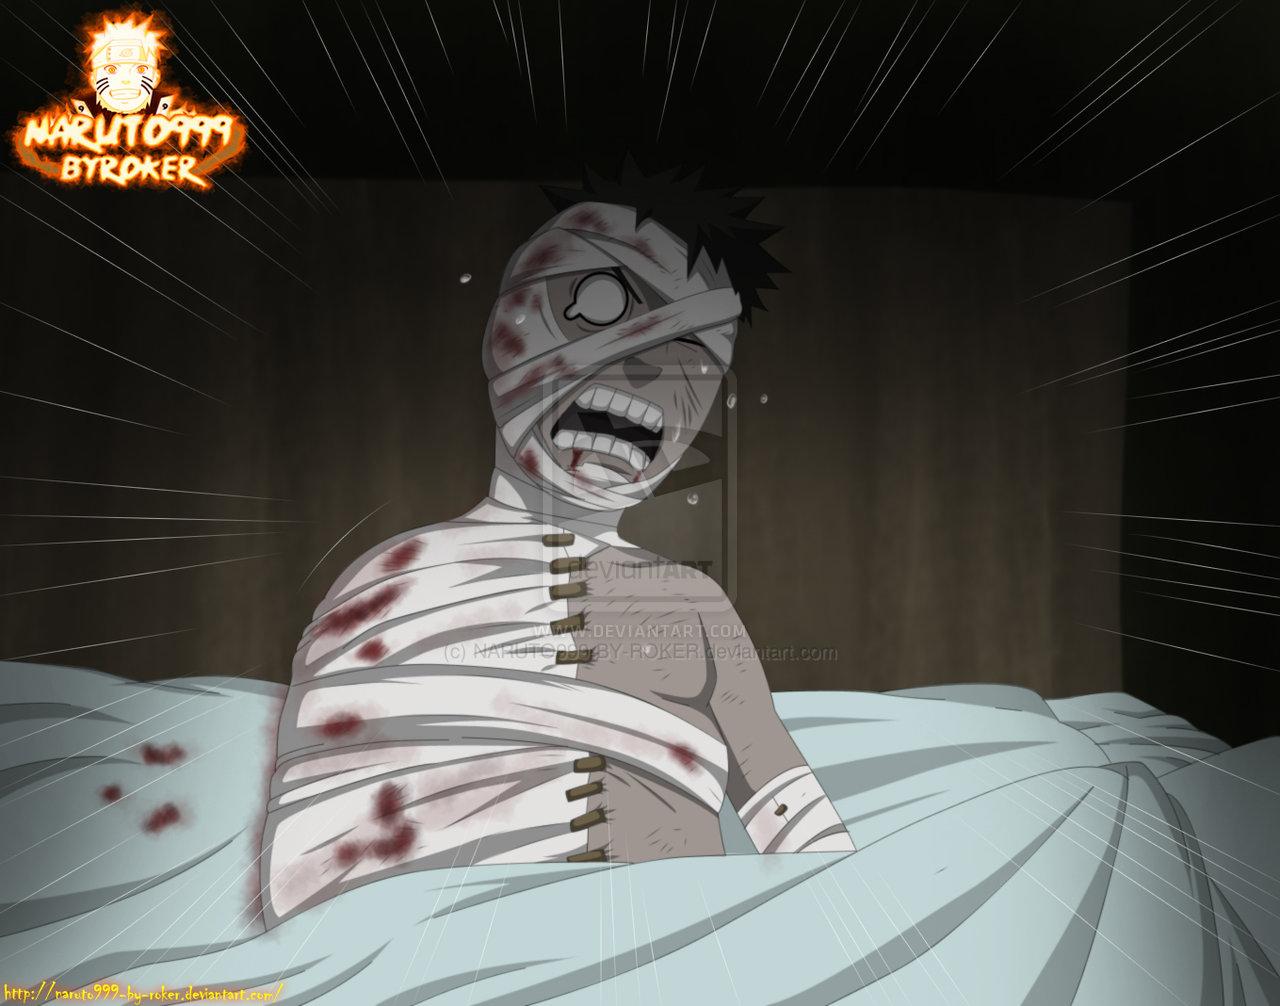 http://1.bp.blogspot.com/-SX2ytXPLDs0/UI32nK06JjI/AAAAAAAAB10/ynvHkHWI5No/s1600/____obito_uchiha_____o_o__manga_602__by_naruto999_by_roker-d5fefqc.jpg